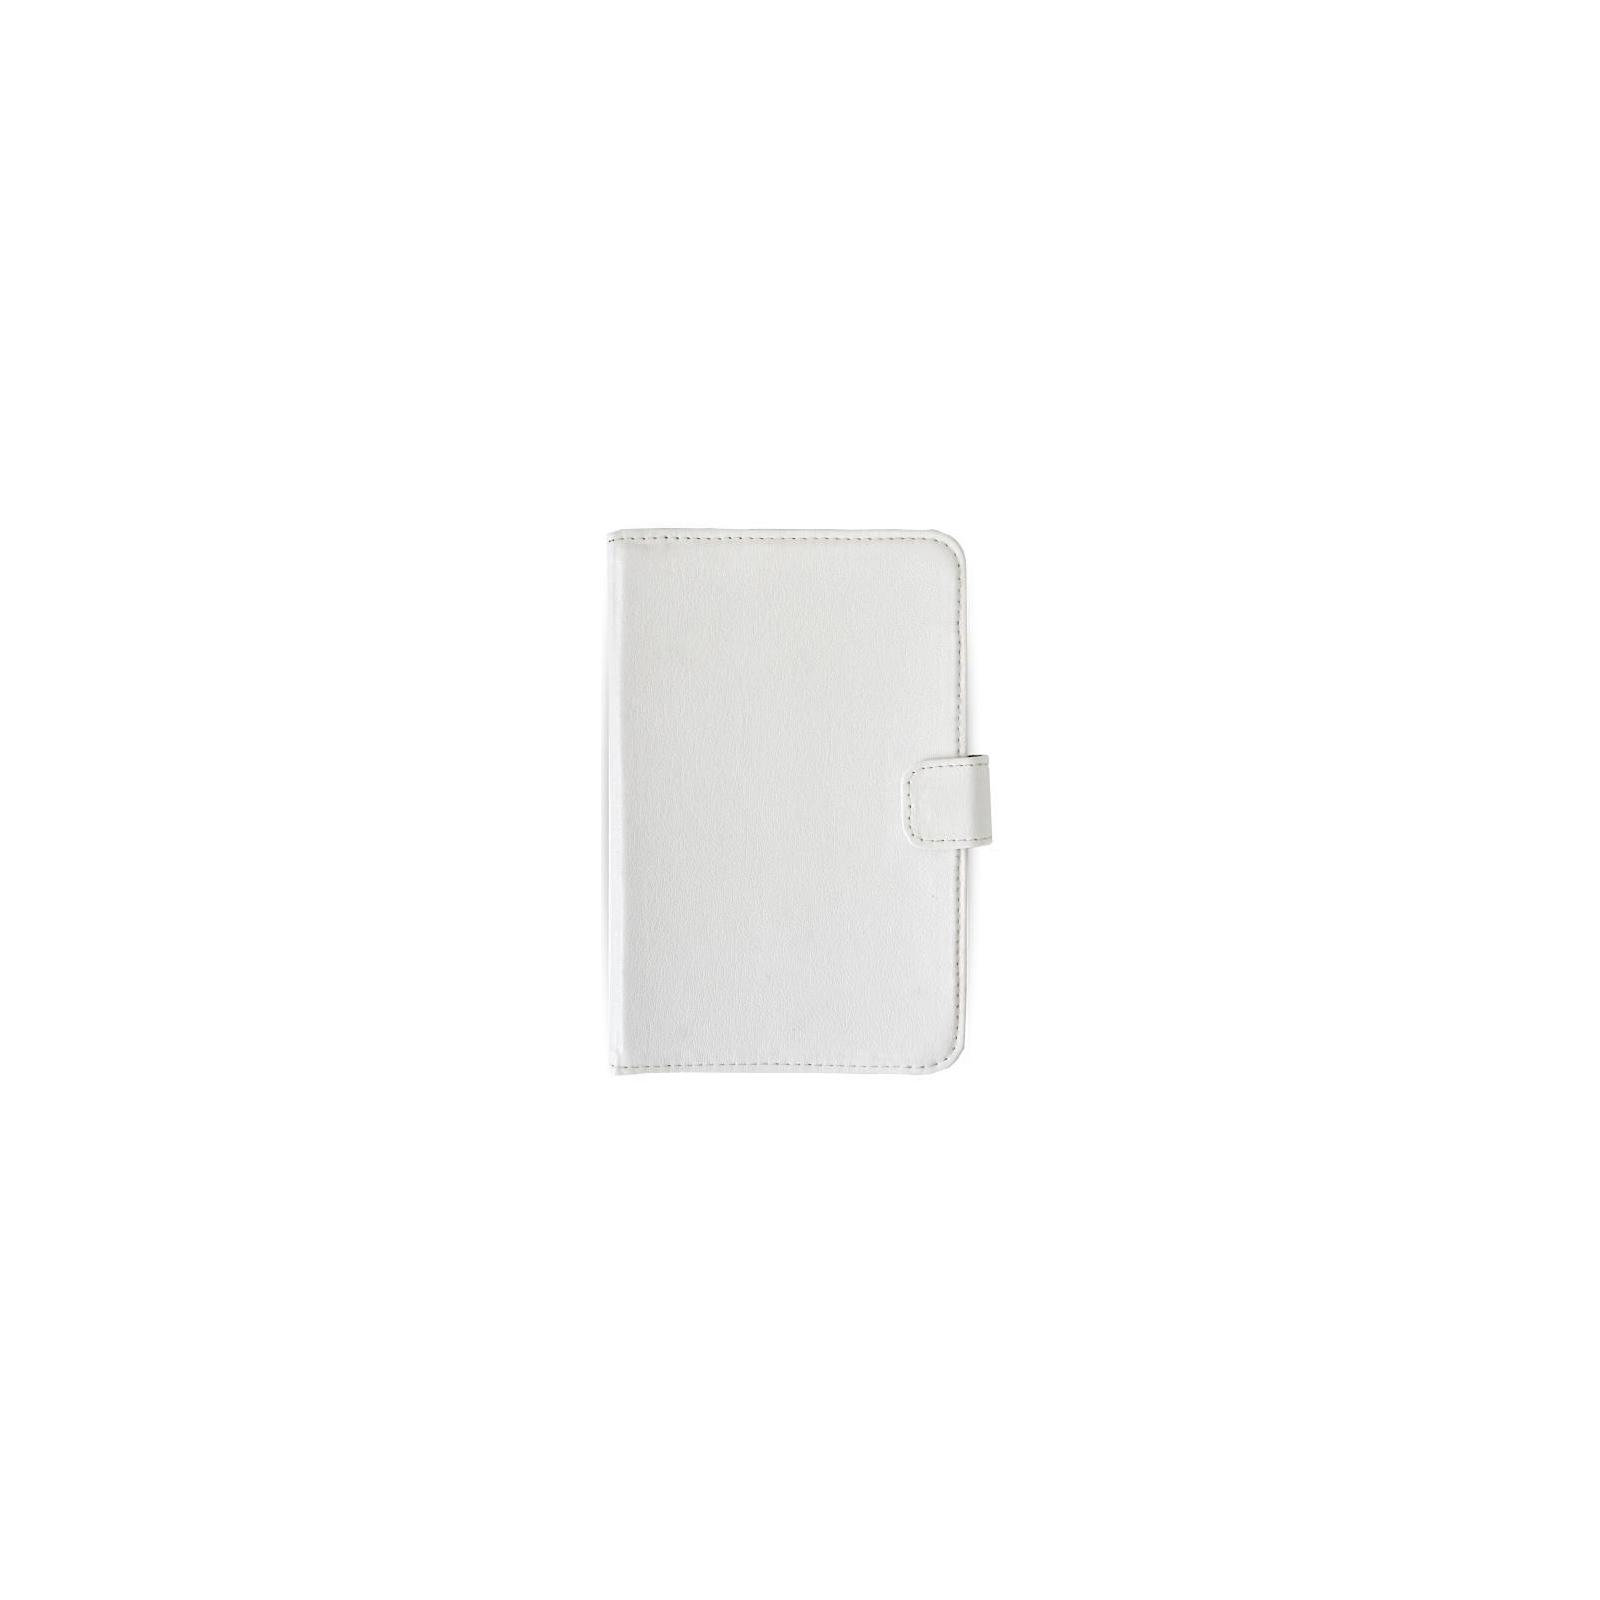 Чехол для планшета Vento 8 Advanced - white